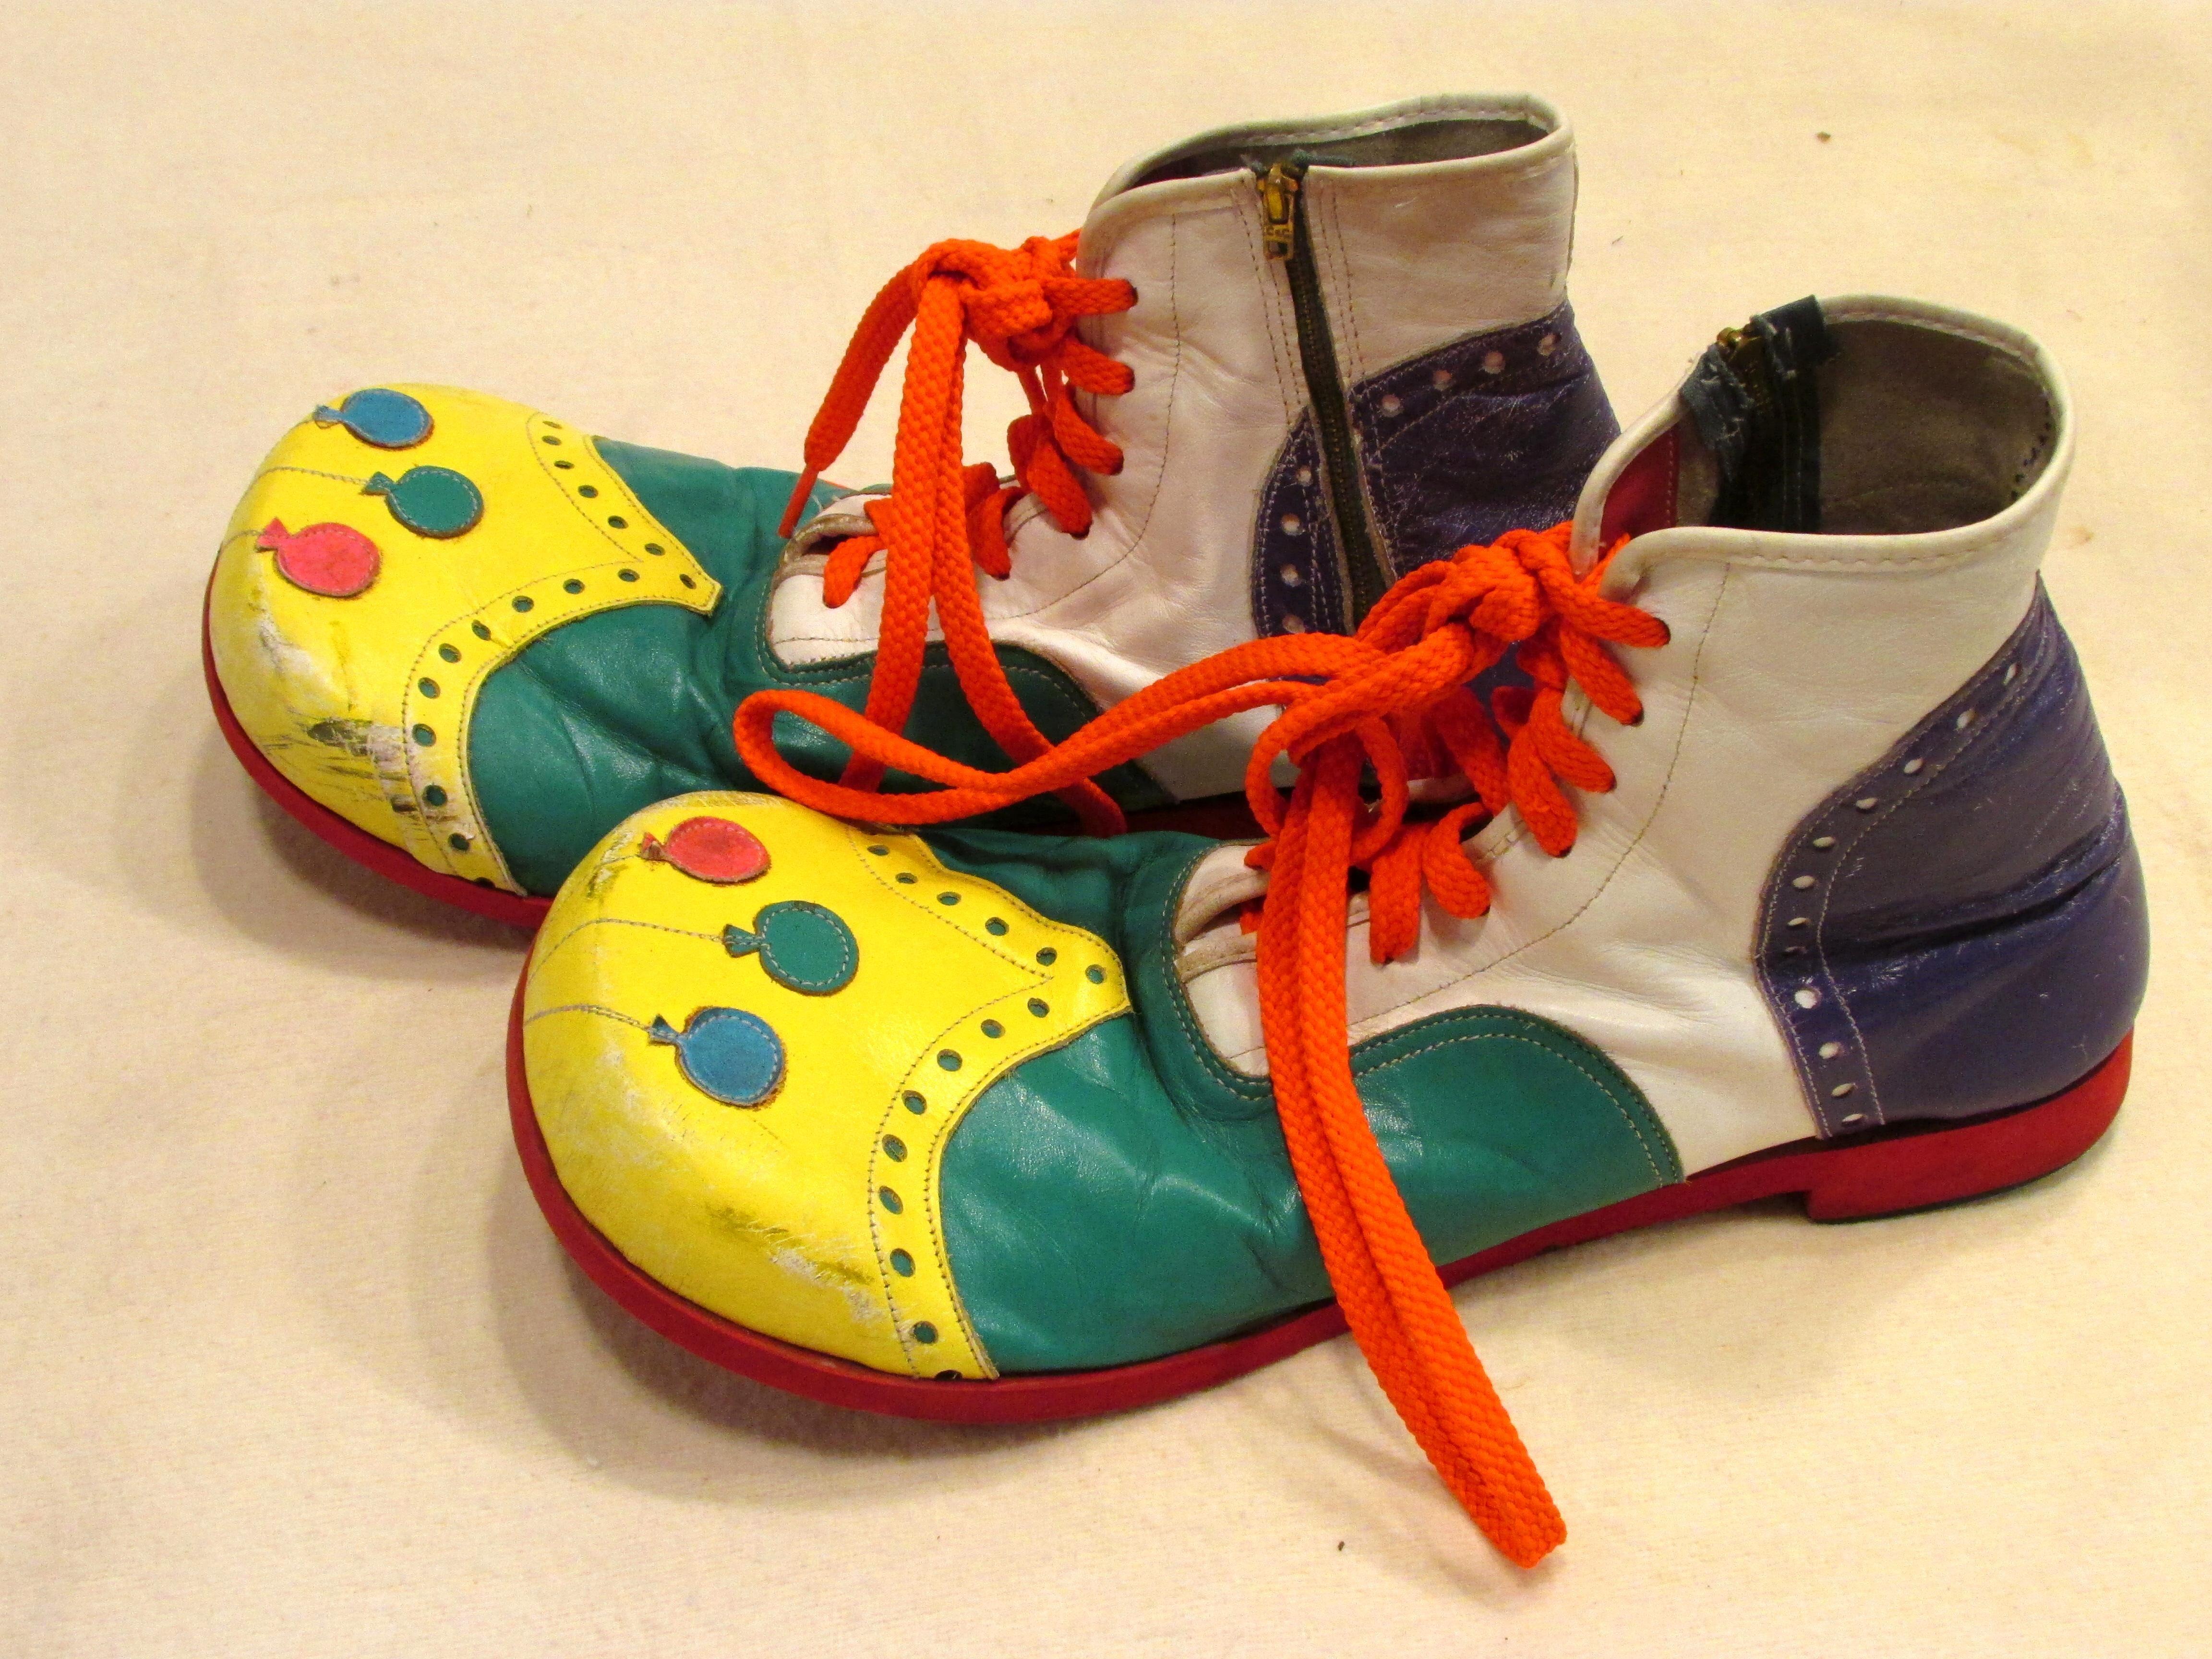 new arrival 6796c cdd93 Balloons Clown Shoes | Clown Shoes | Clown shoes, Retro ...